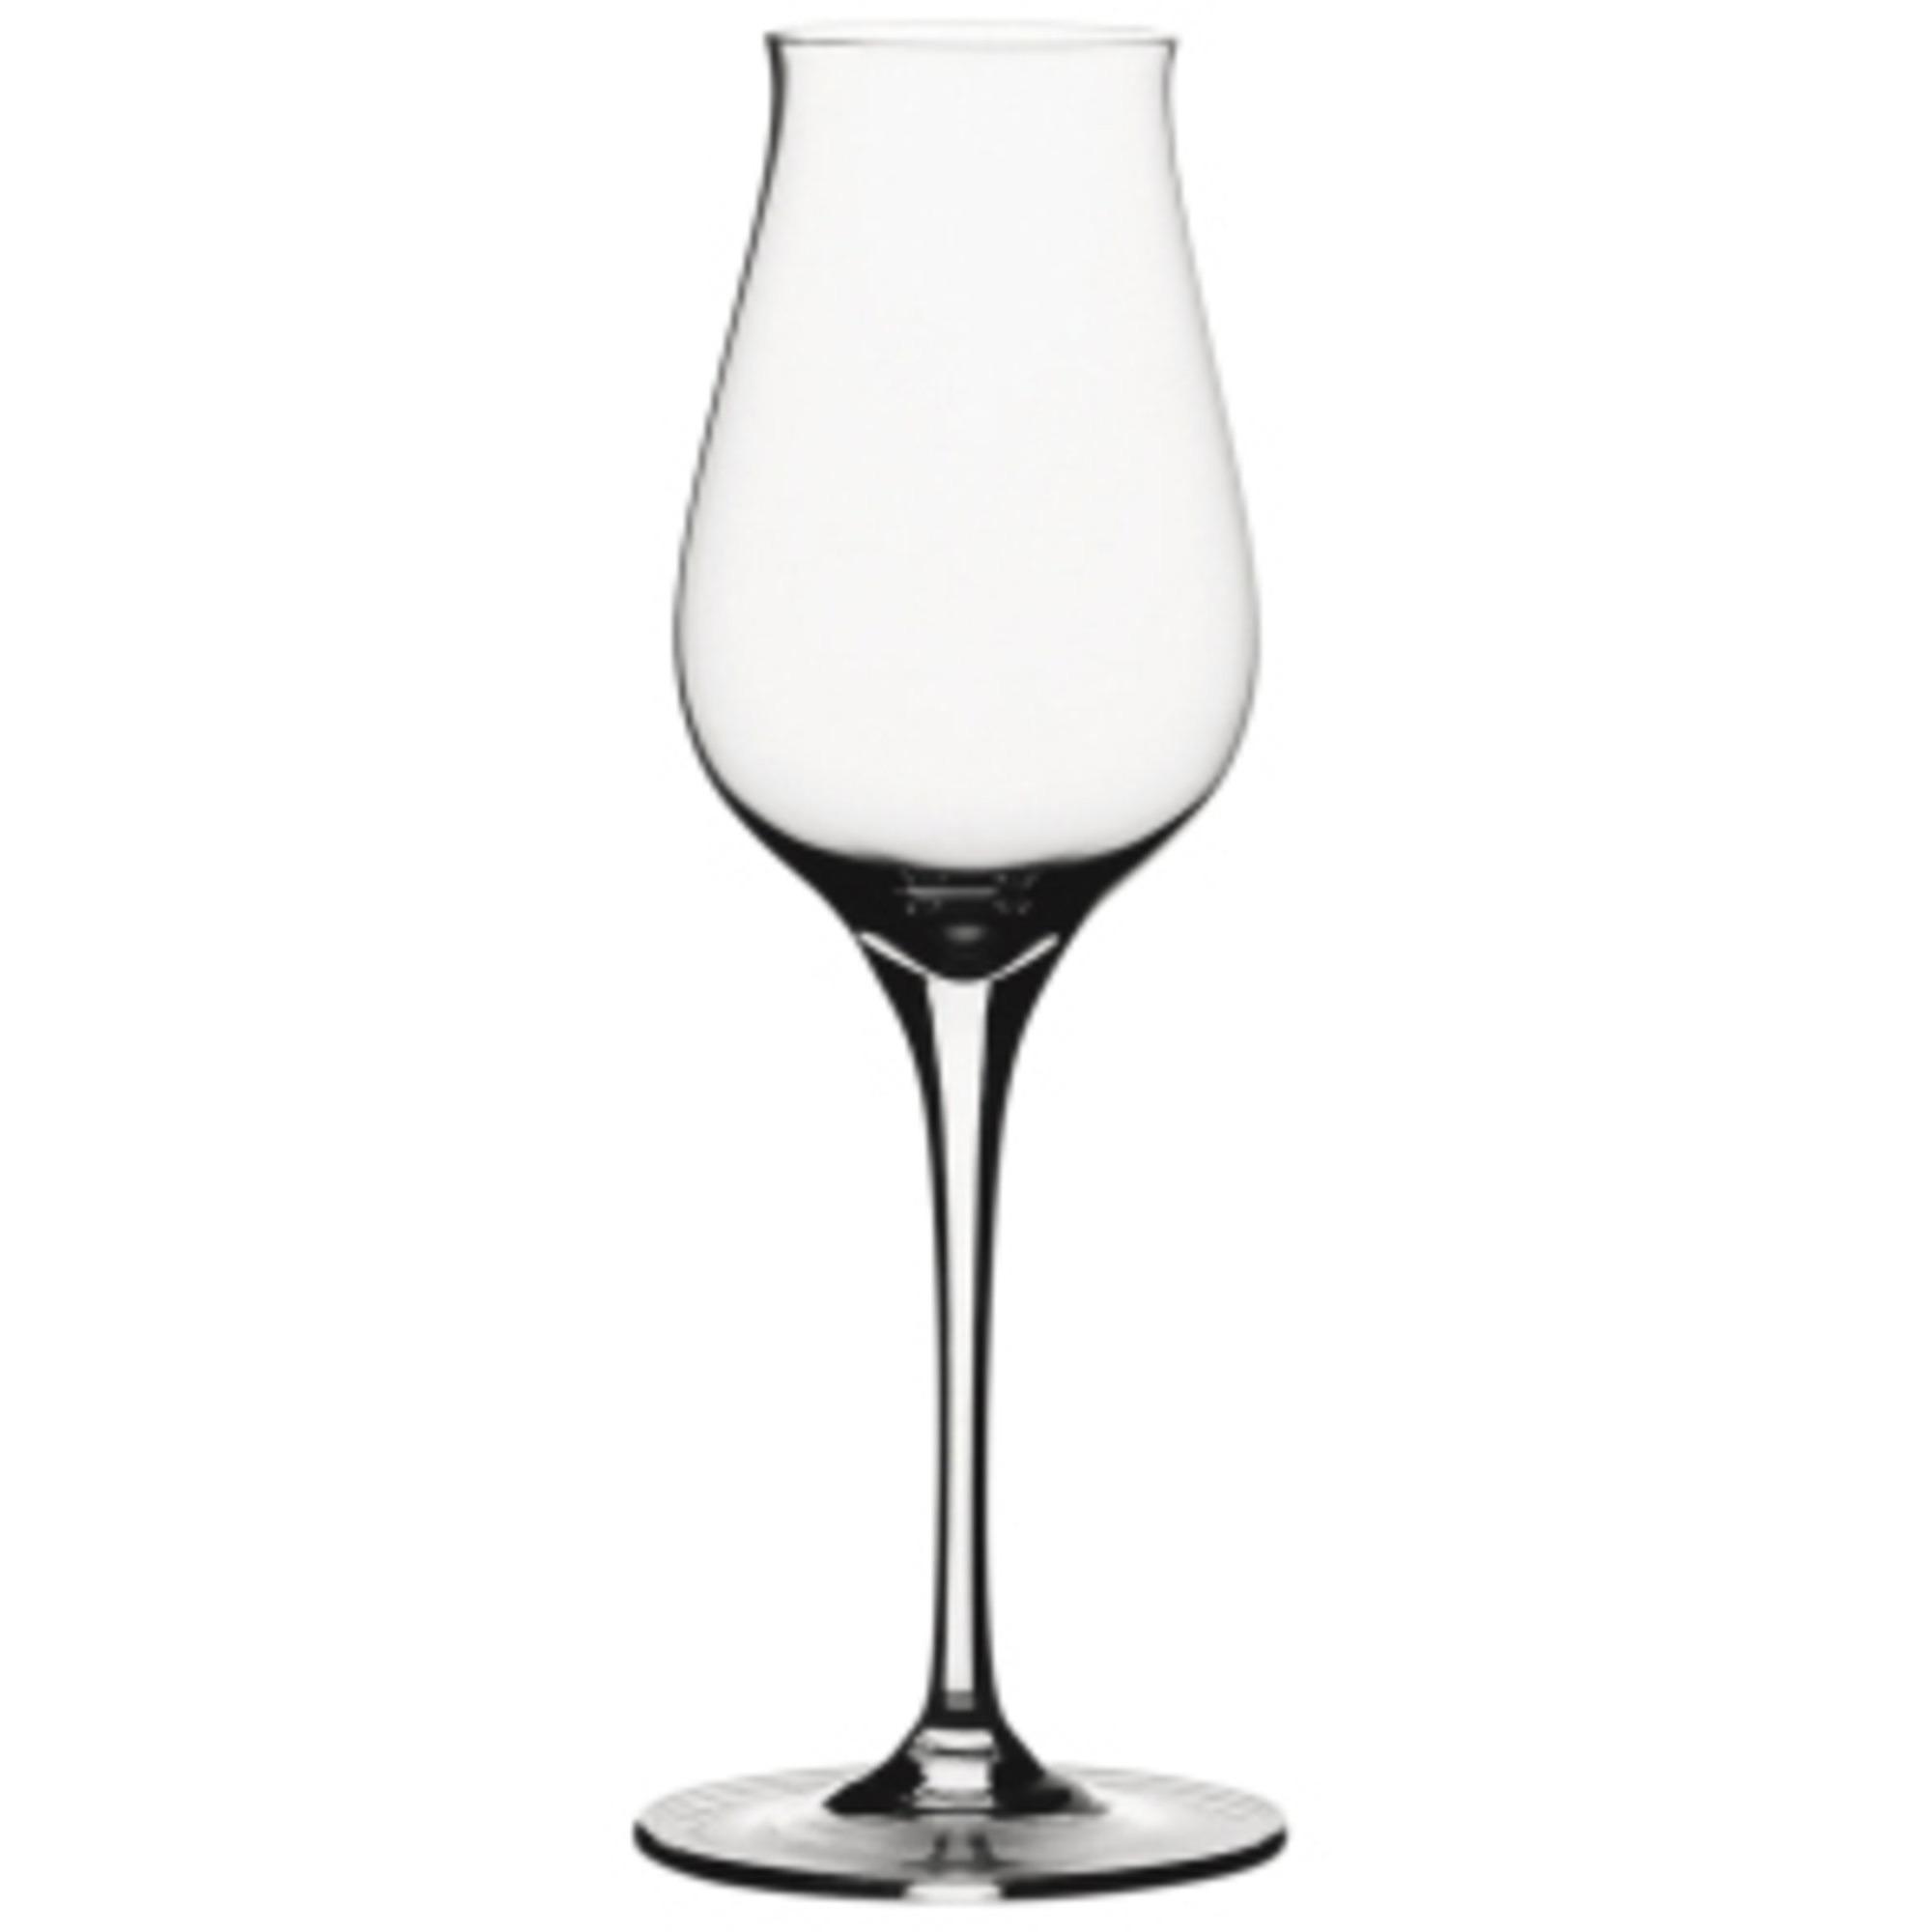 Spiegelau Whiskyglas 17cl 4-pack